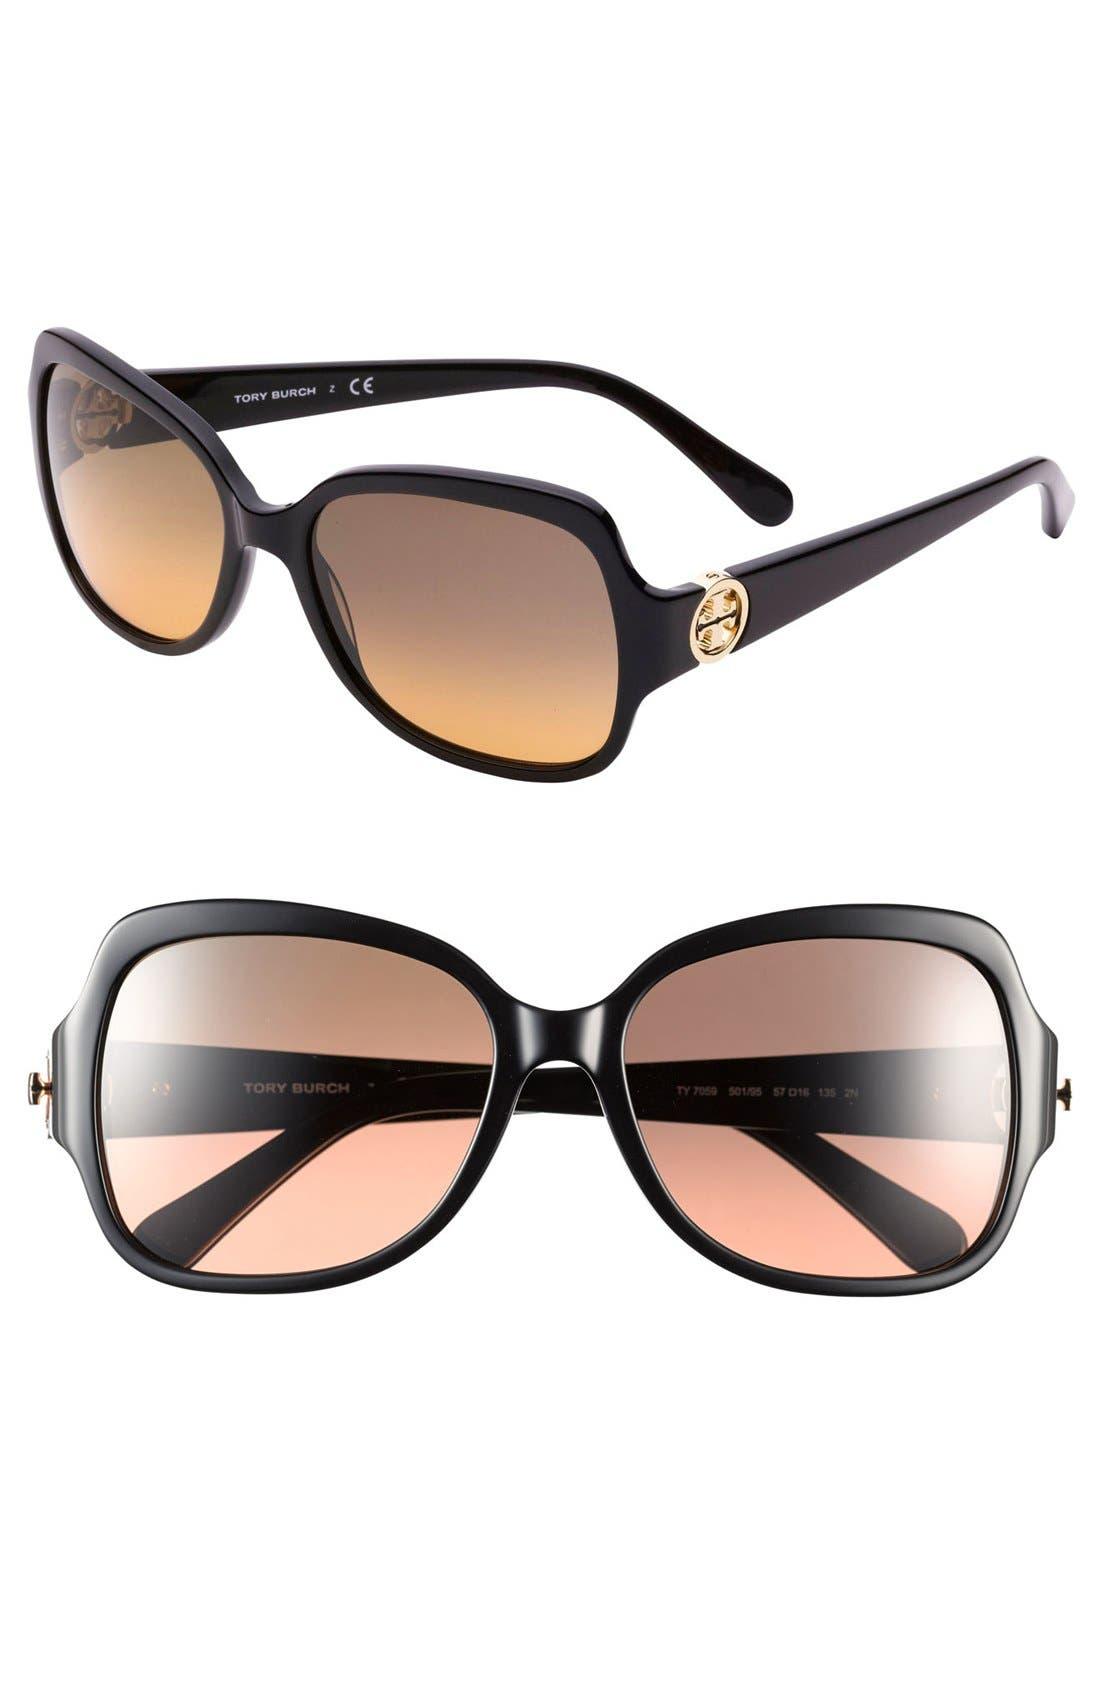 Alternate Image 1 Selected - Tory Burch 'Glam' 57mm Logo Hinge Sunglasses